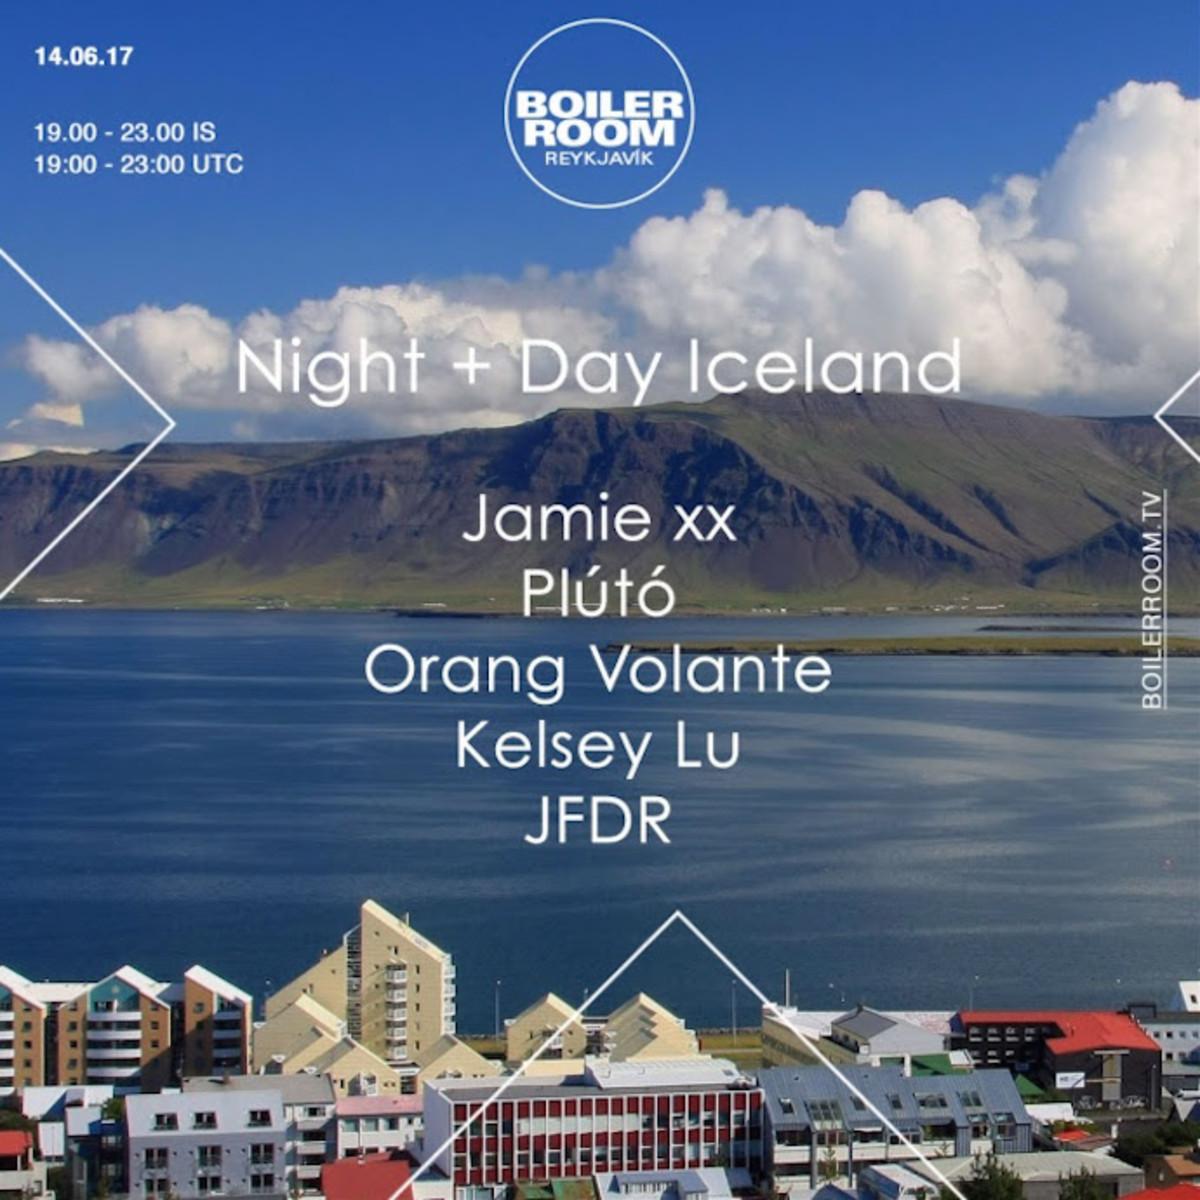 Jamie xx Boiler Room Set Iceland 2017